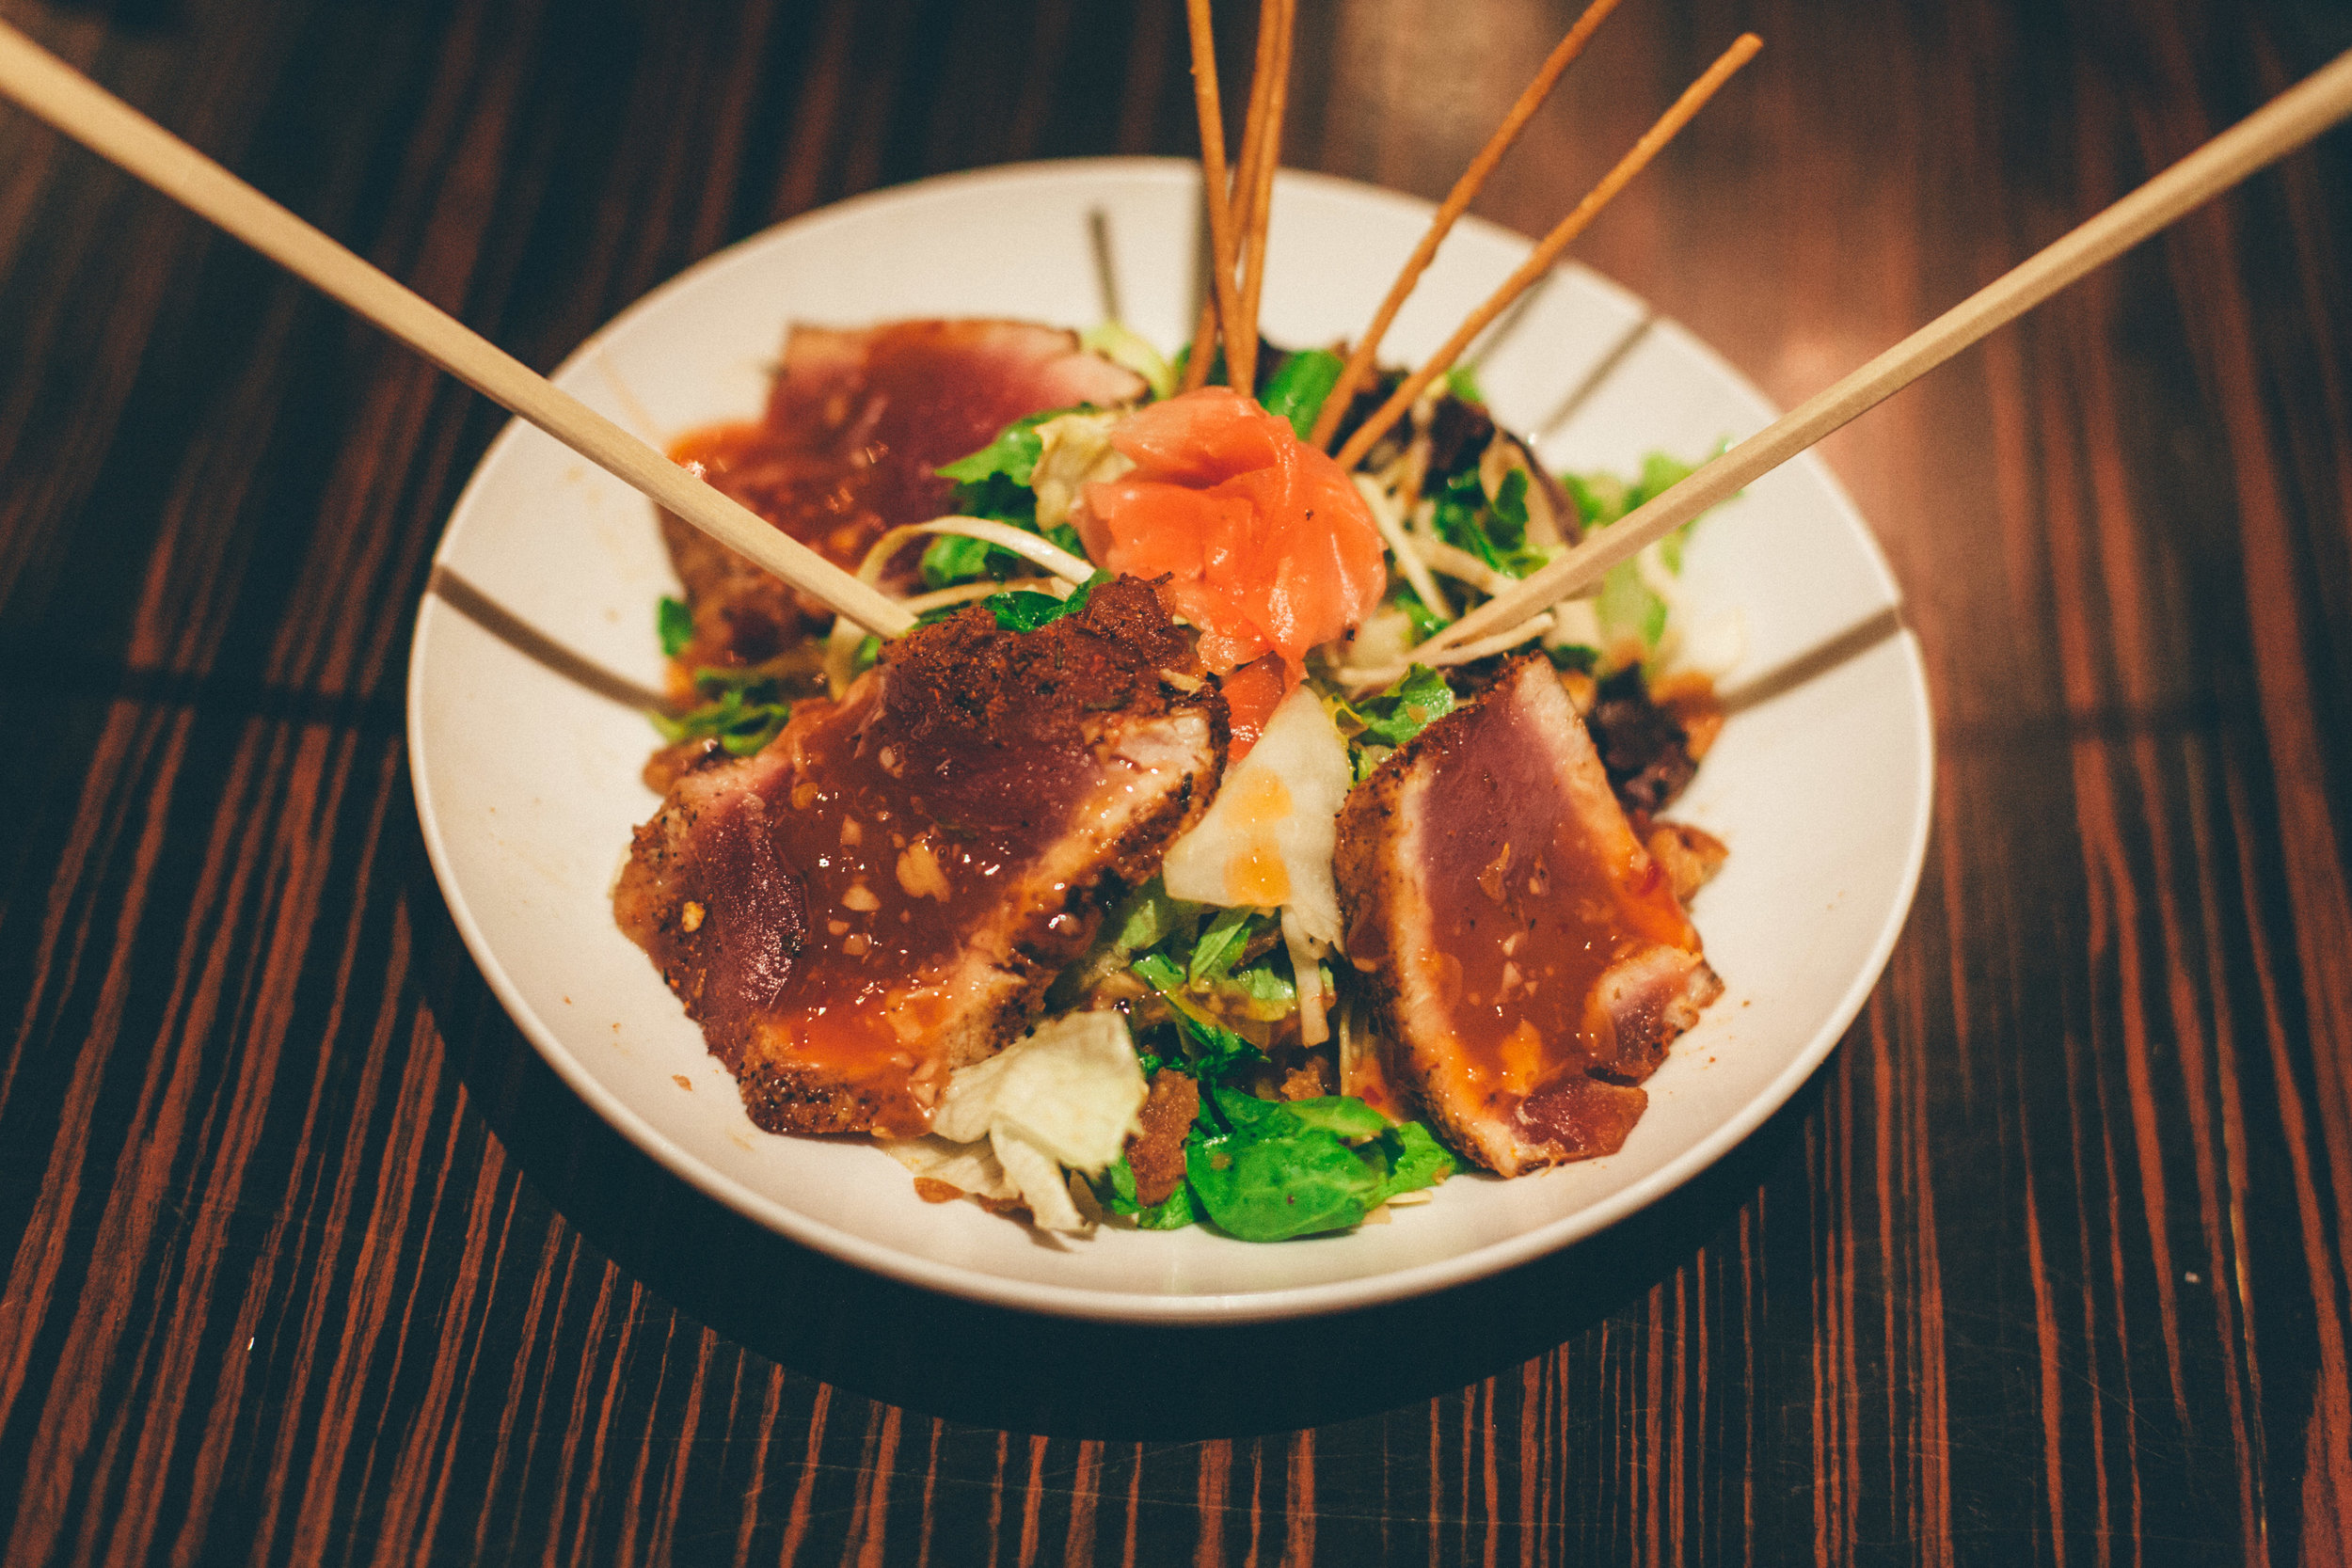 Ahi Tuna Salad: Blackened yellowfin tuna, Asian slaw, pecans, asparagus tips, crispy wontons and ponzu-peanut vinaigrette